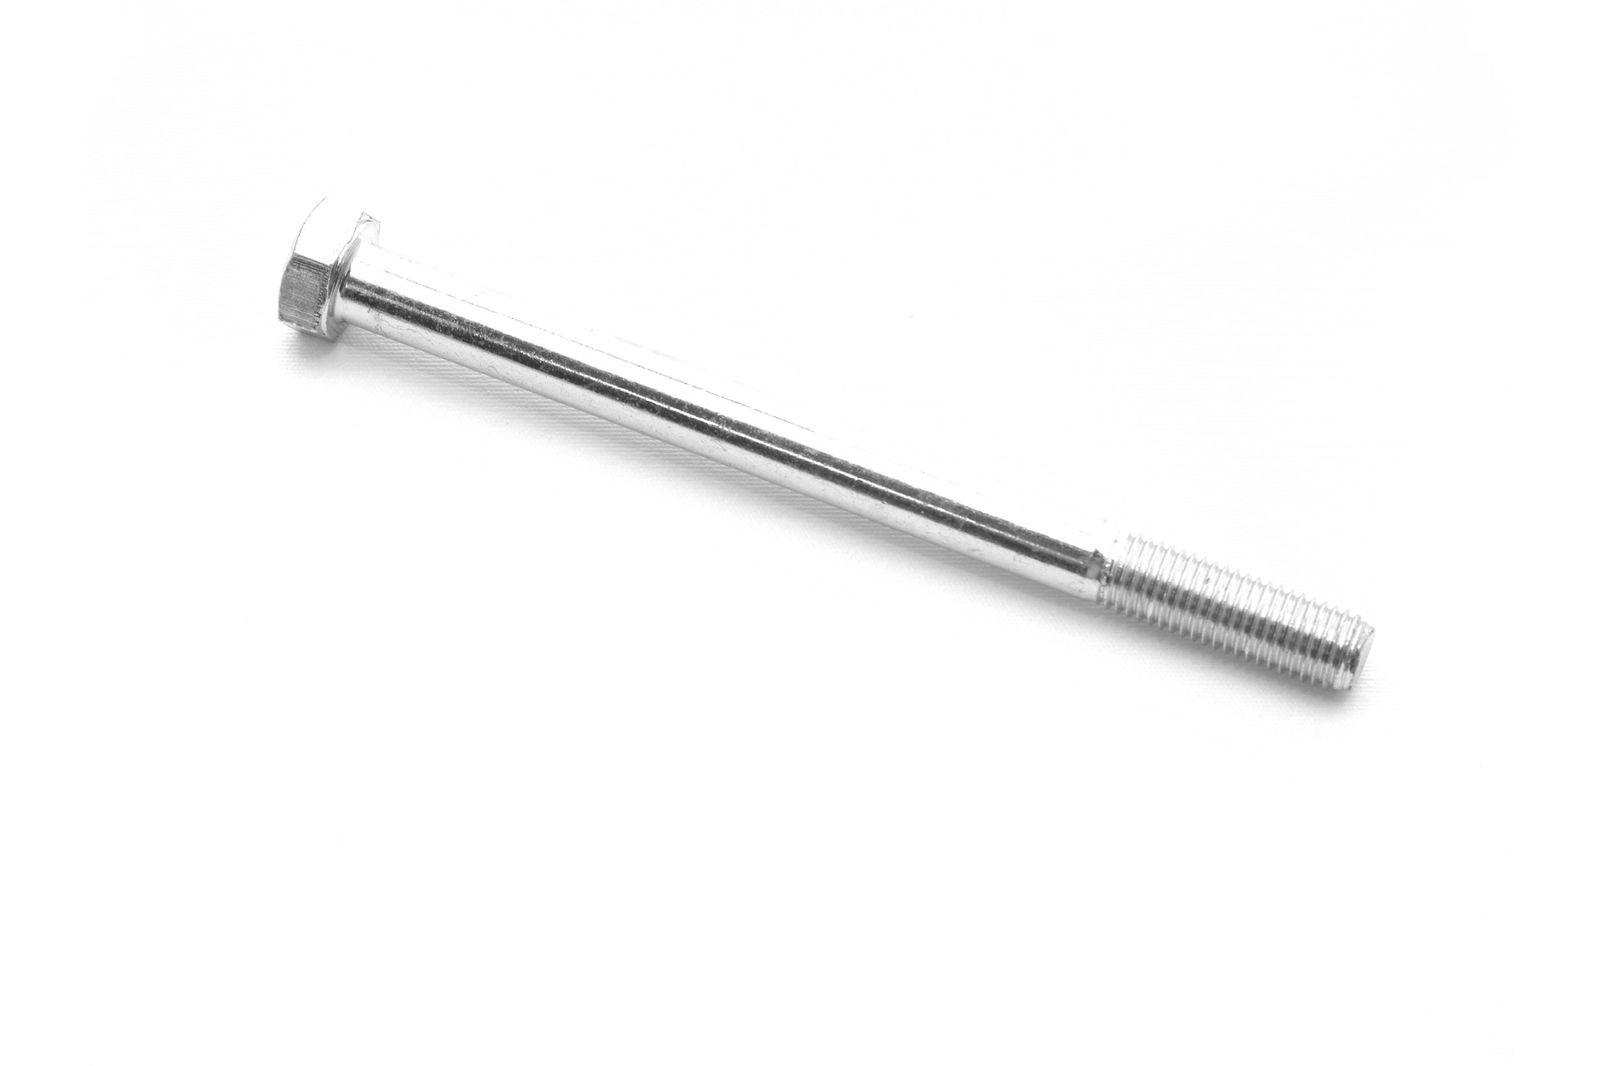 "#1002-32 Bolzen UNF 5/16"" x 4"", BH605321"